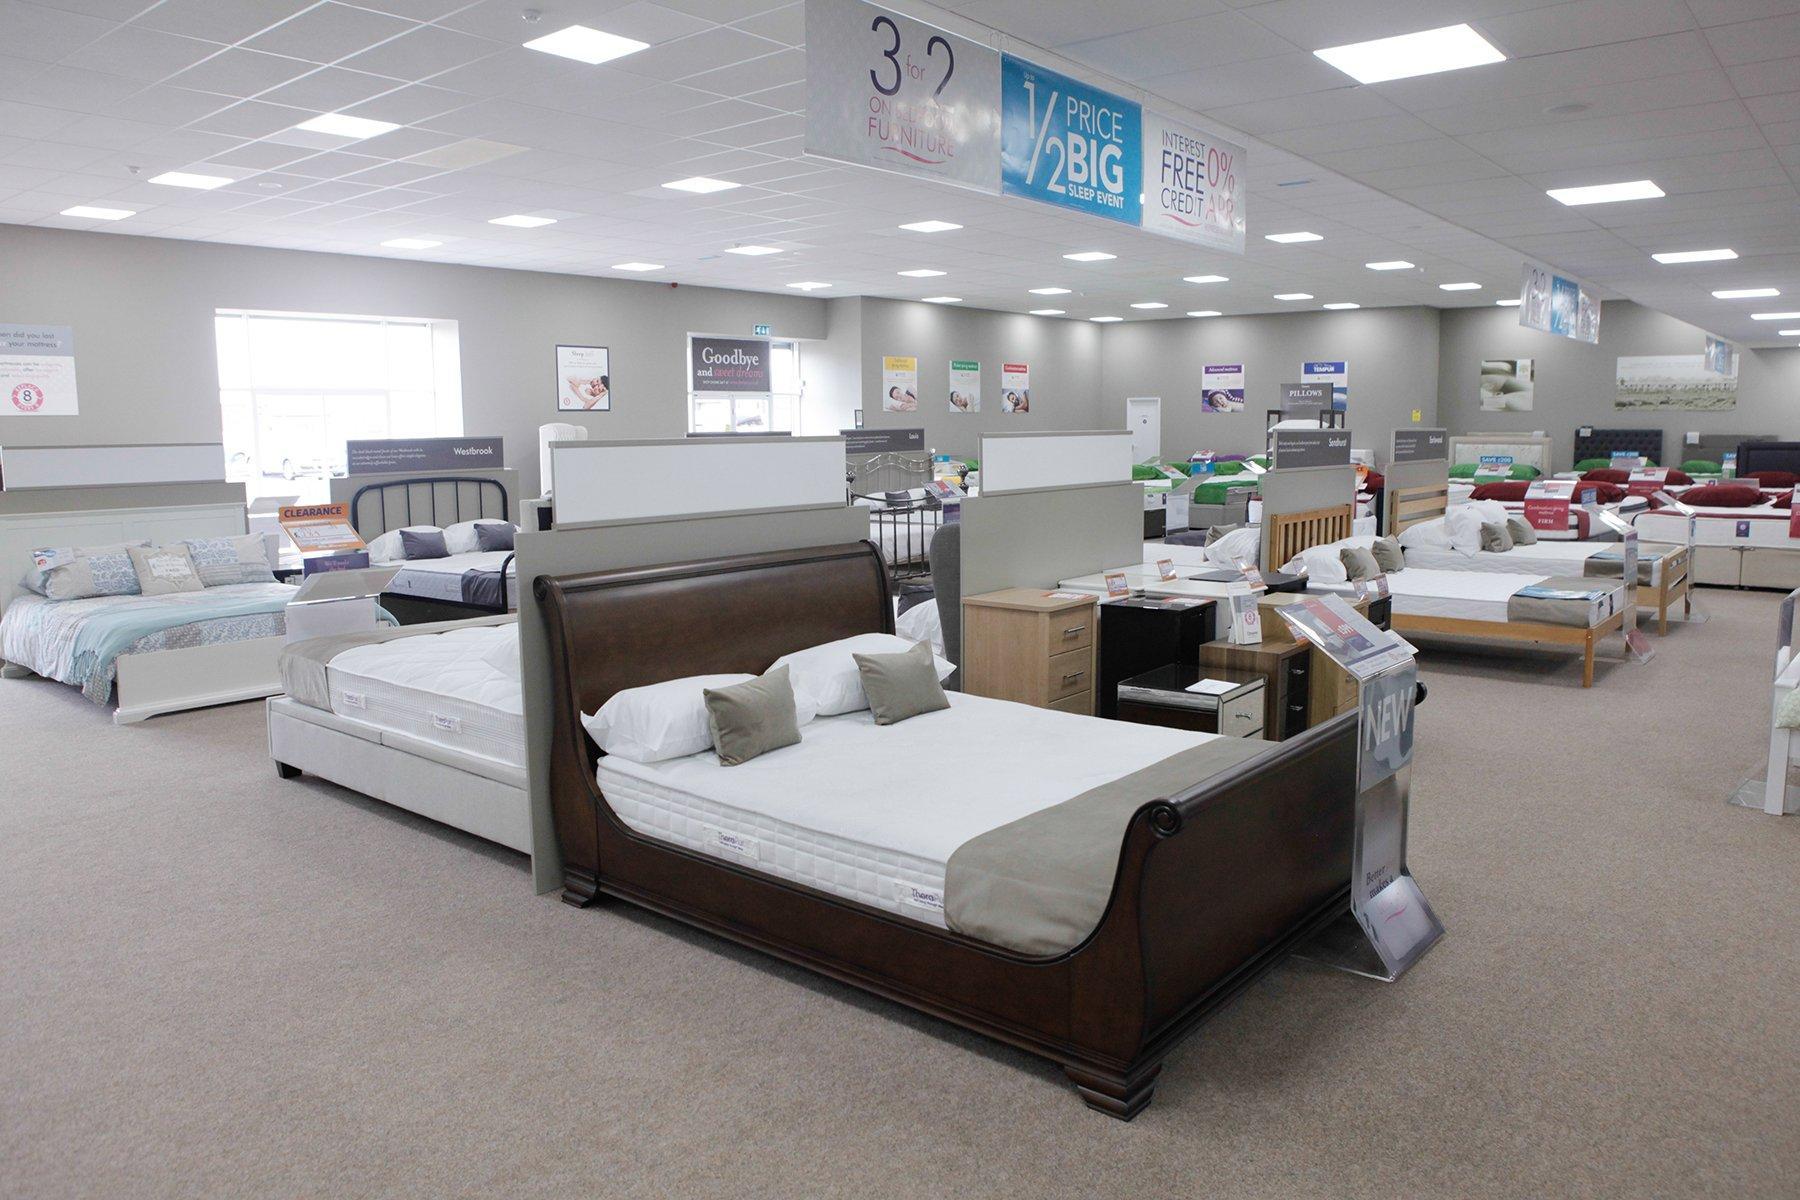 free sofa uplift glasgow lee dreams store in uddingston beds mattresses furniture